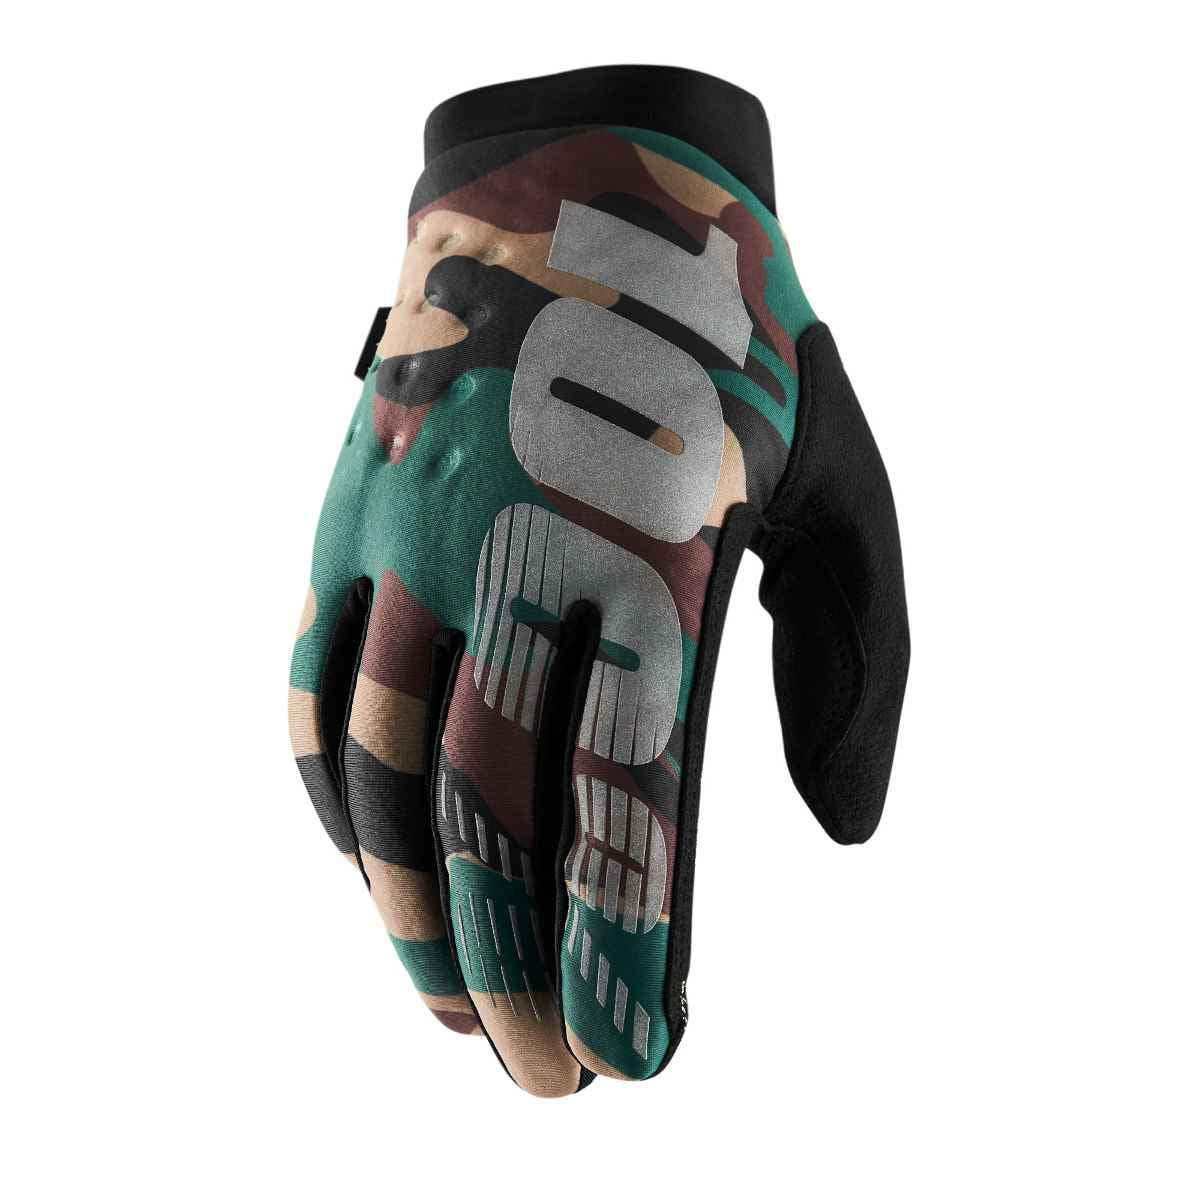 100% Percent BRISKER 100% Glove